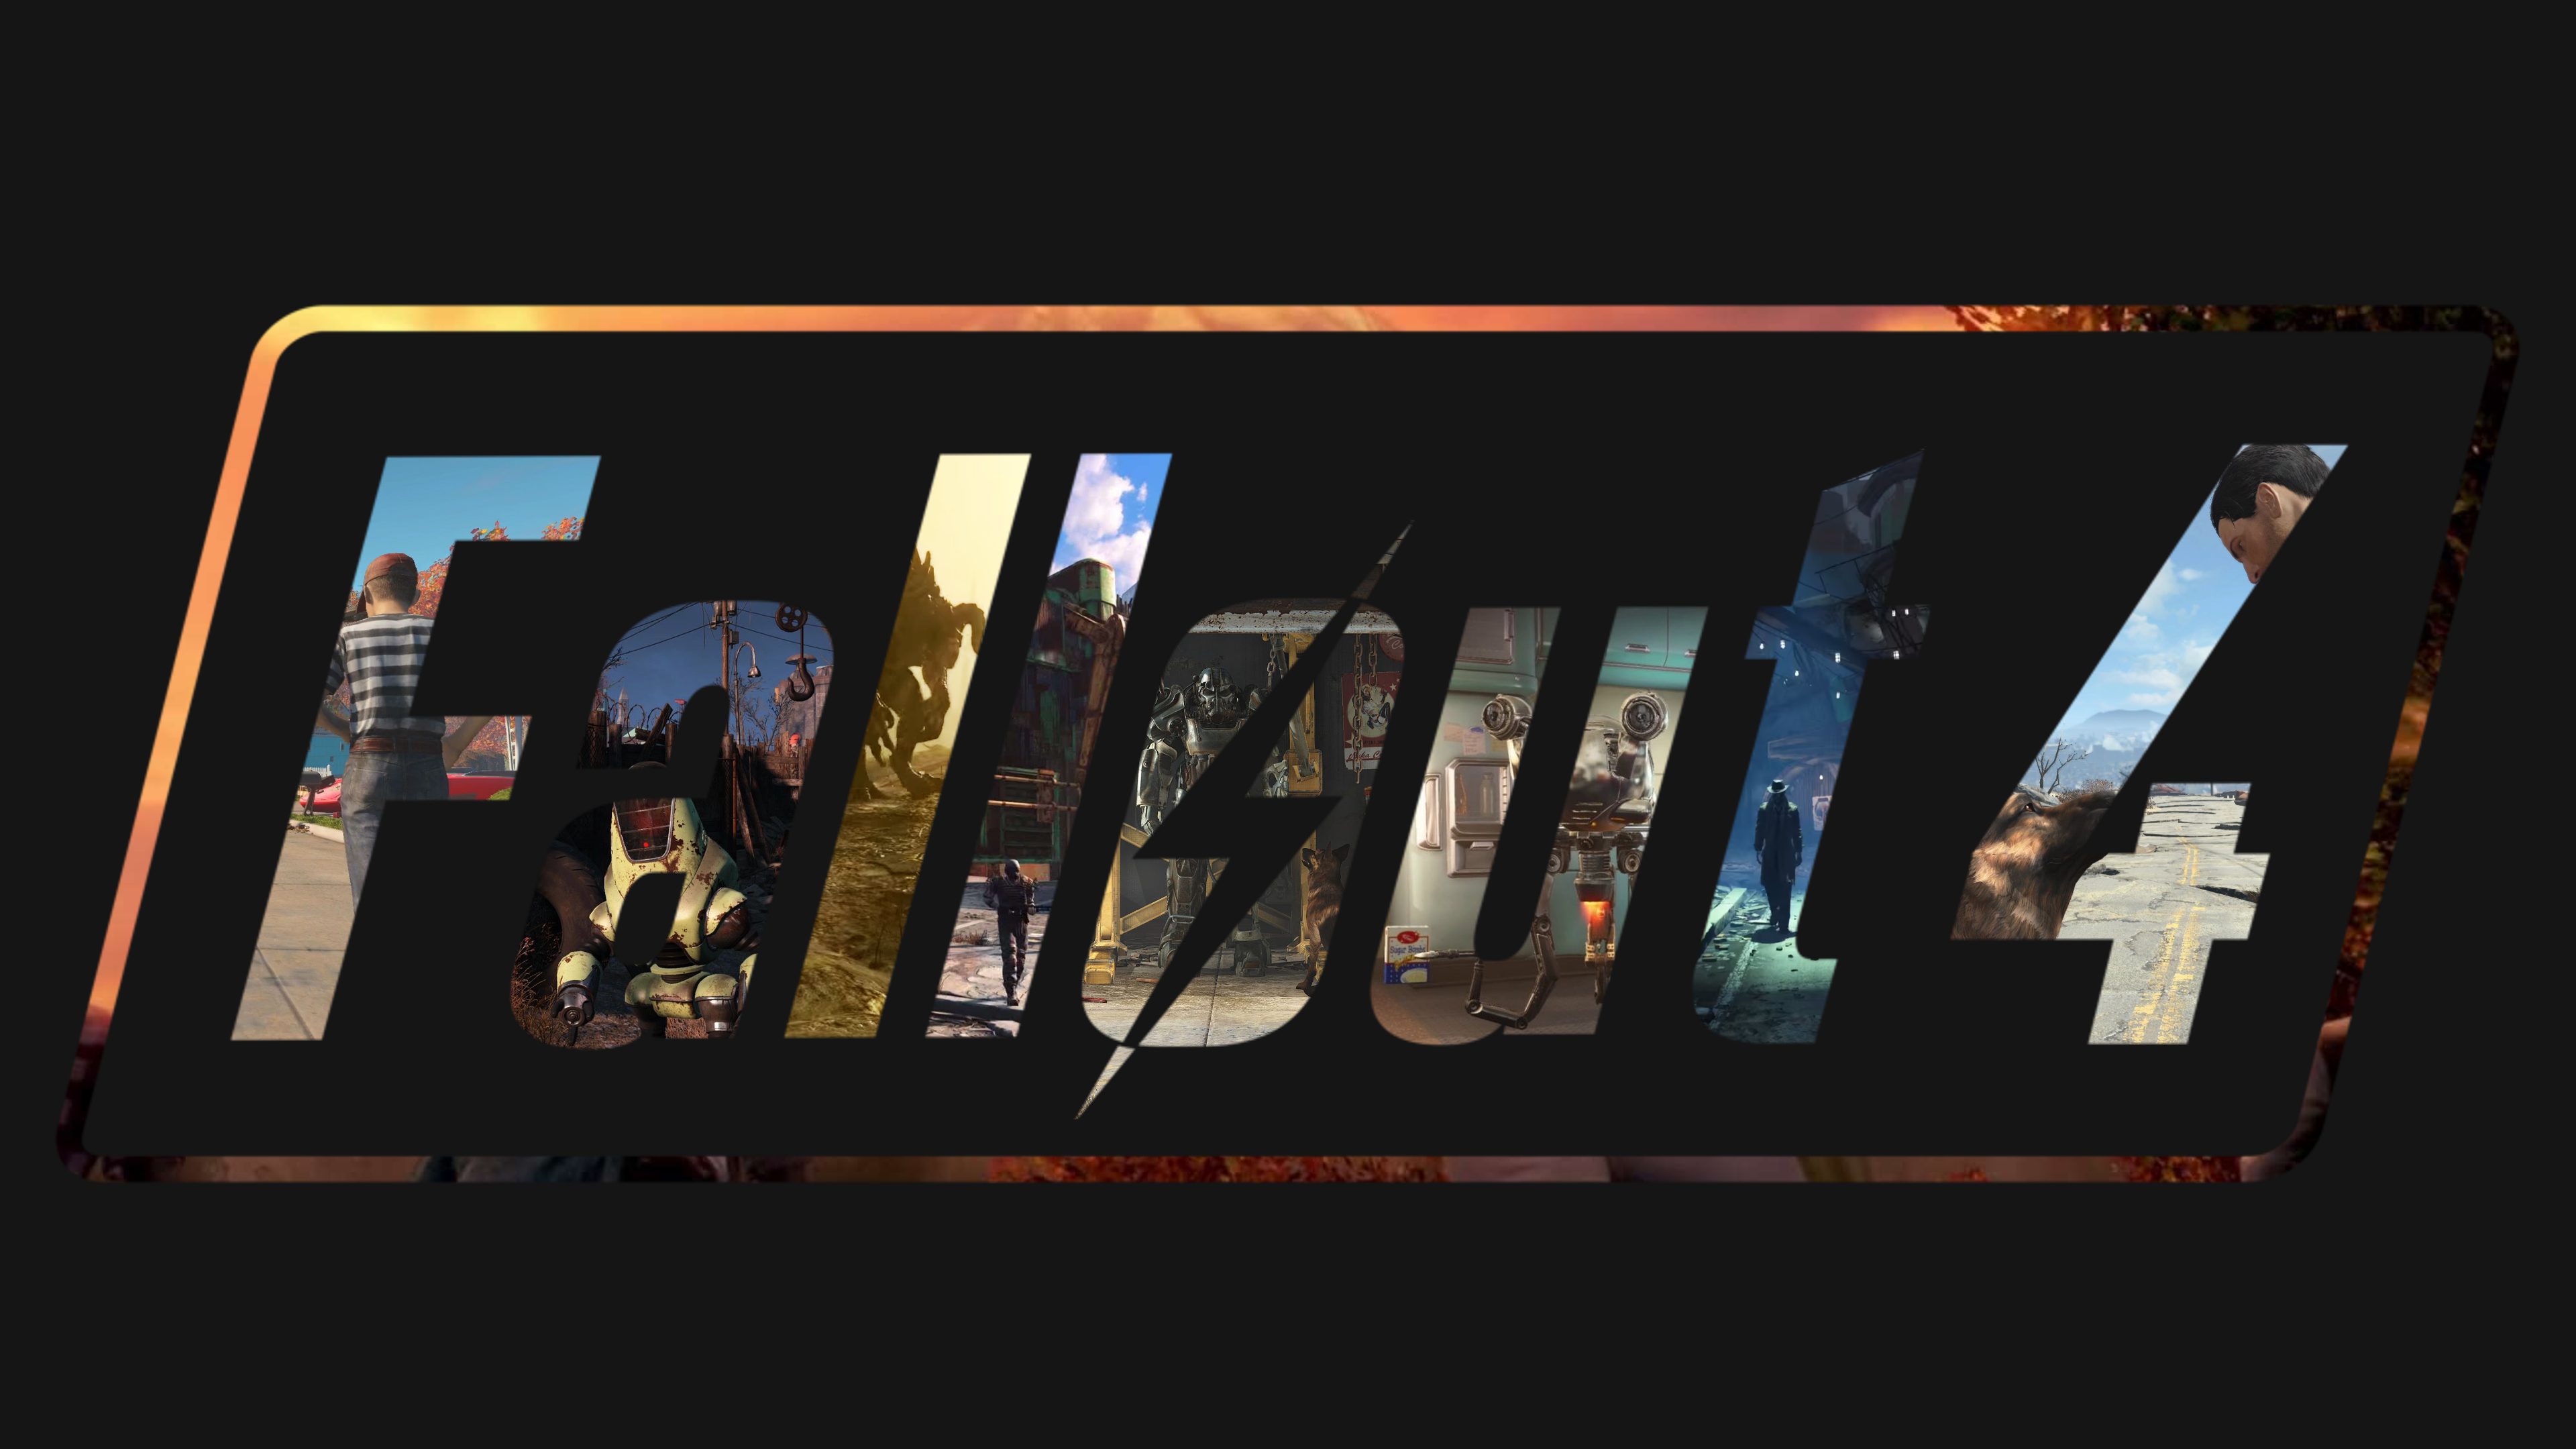 fallout 3 desktop backgrounds